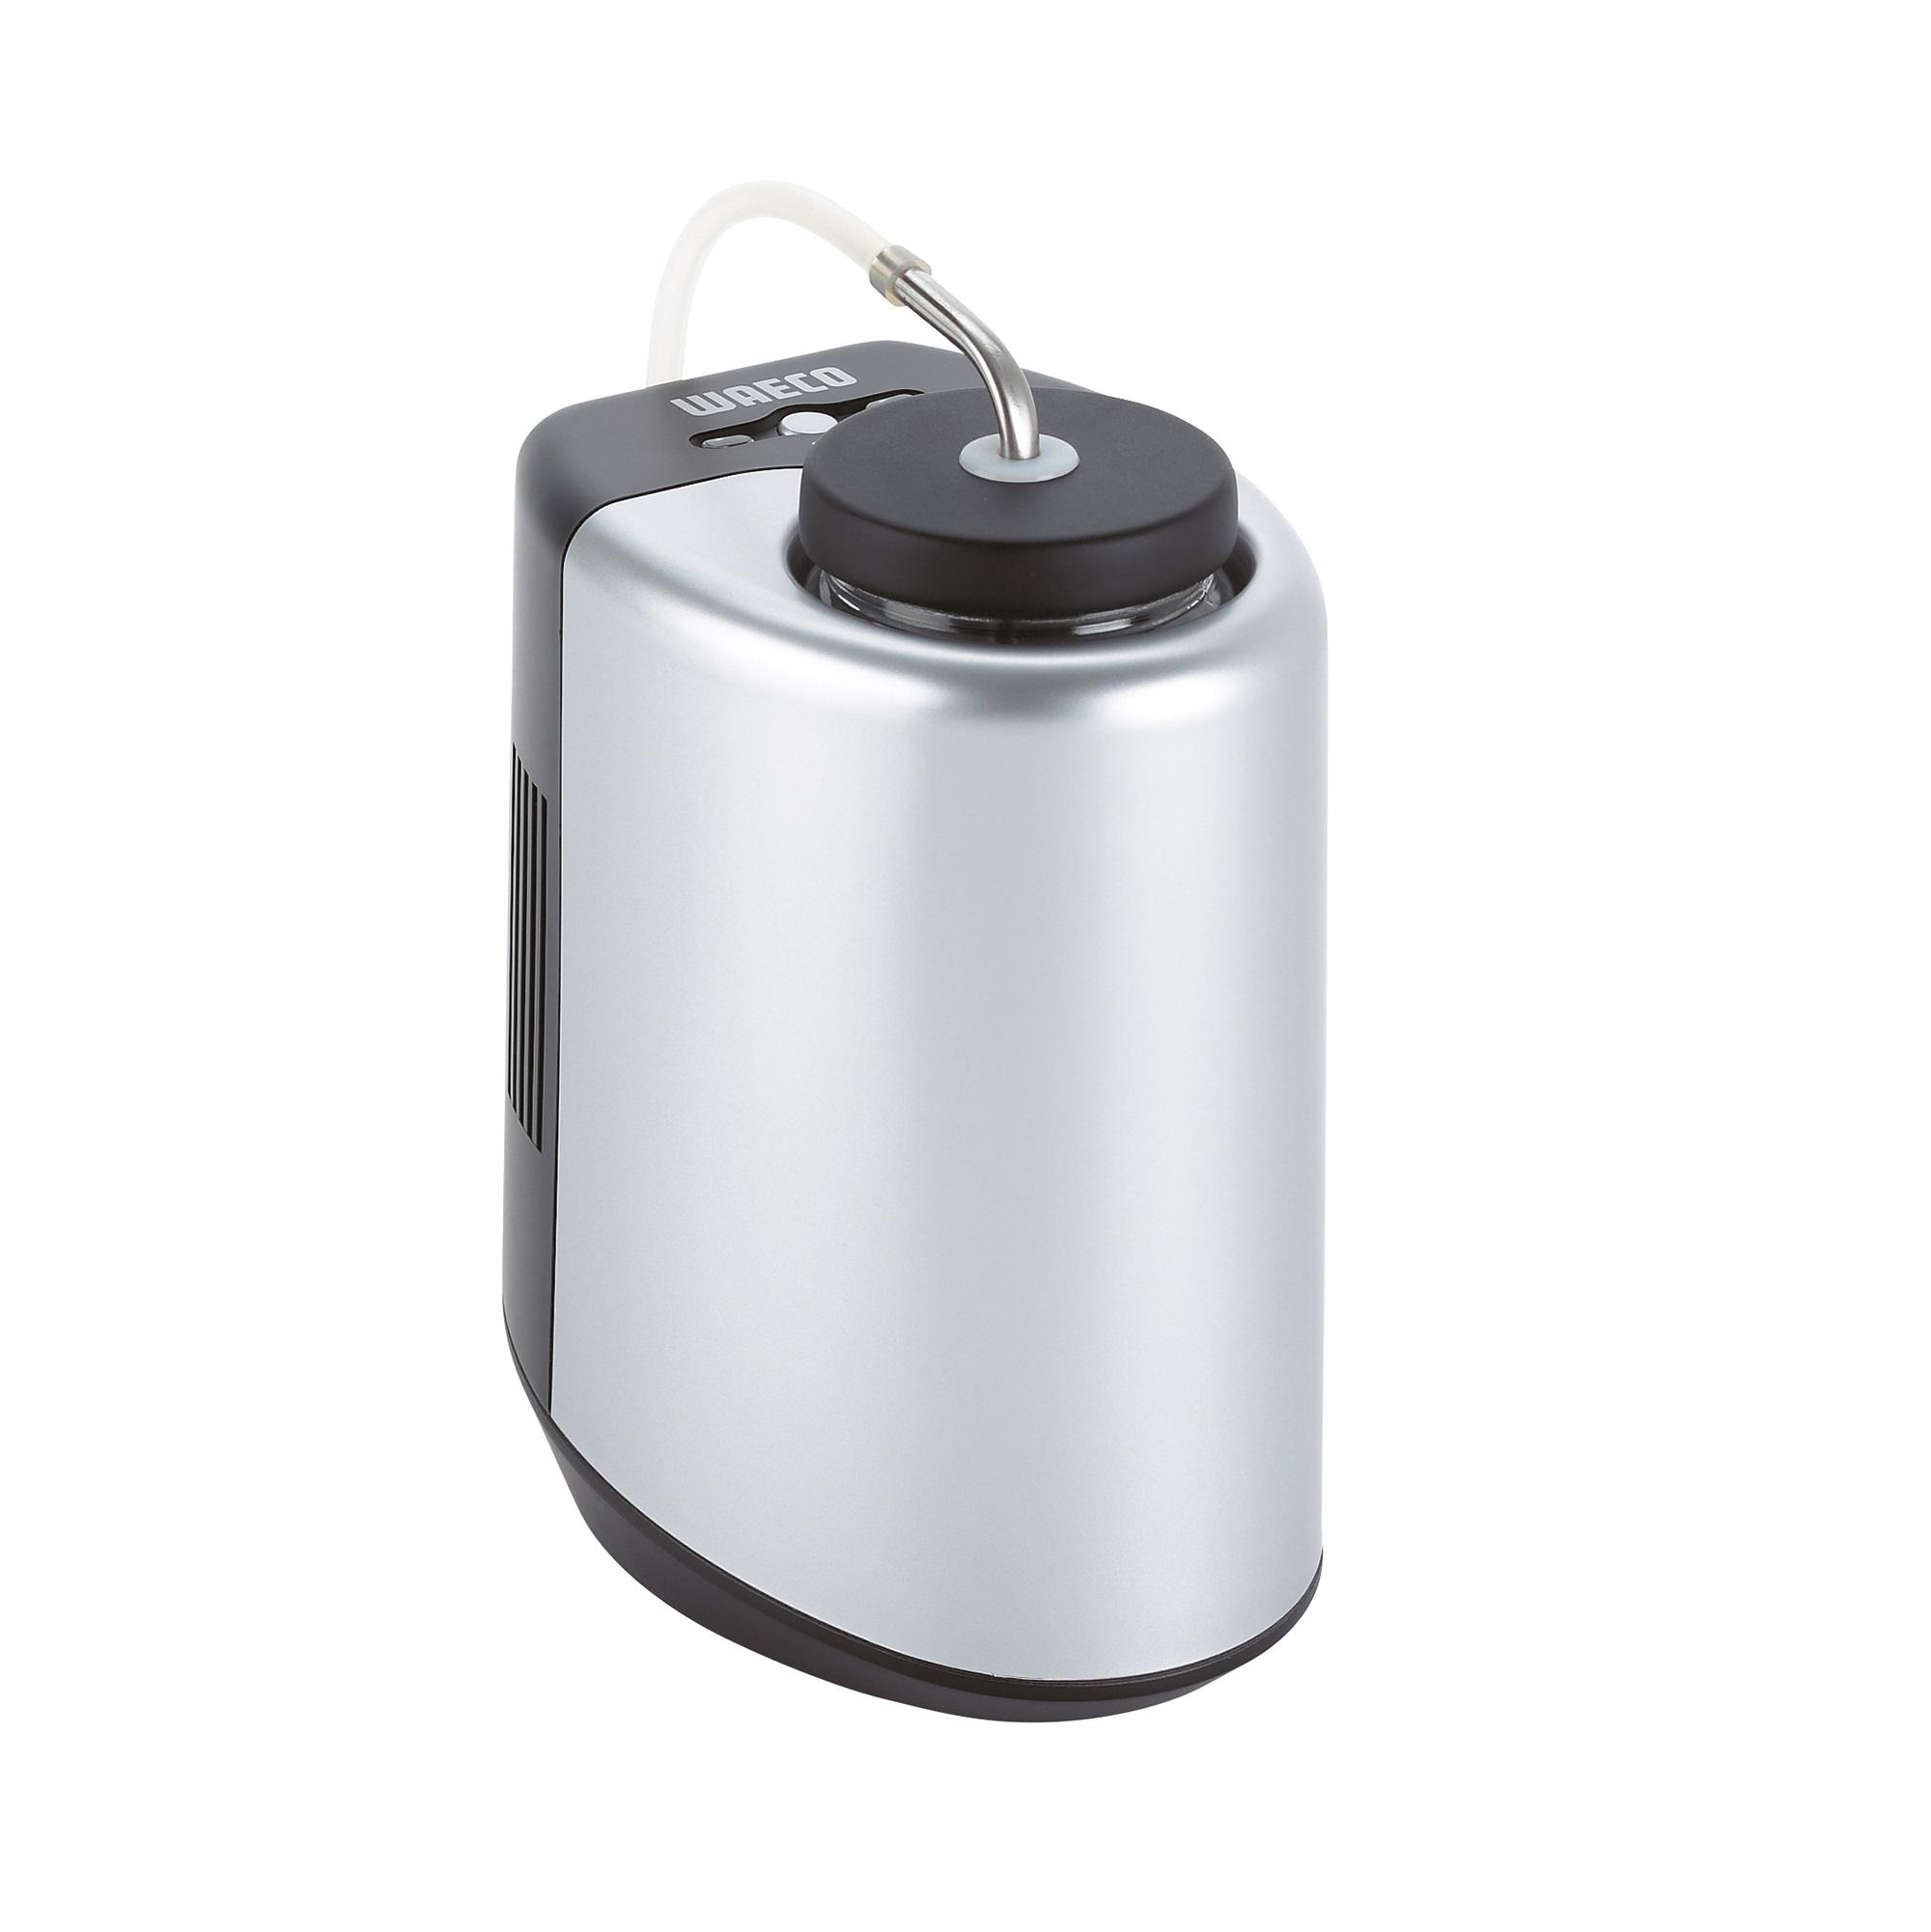 waeco myfridge mf 05m milchkühler für kaffeeautomaten - dometic